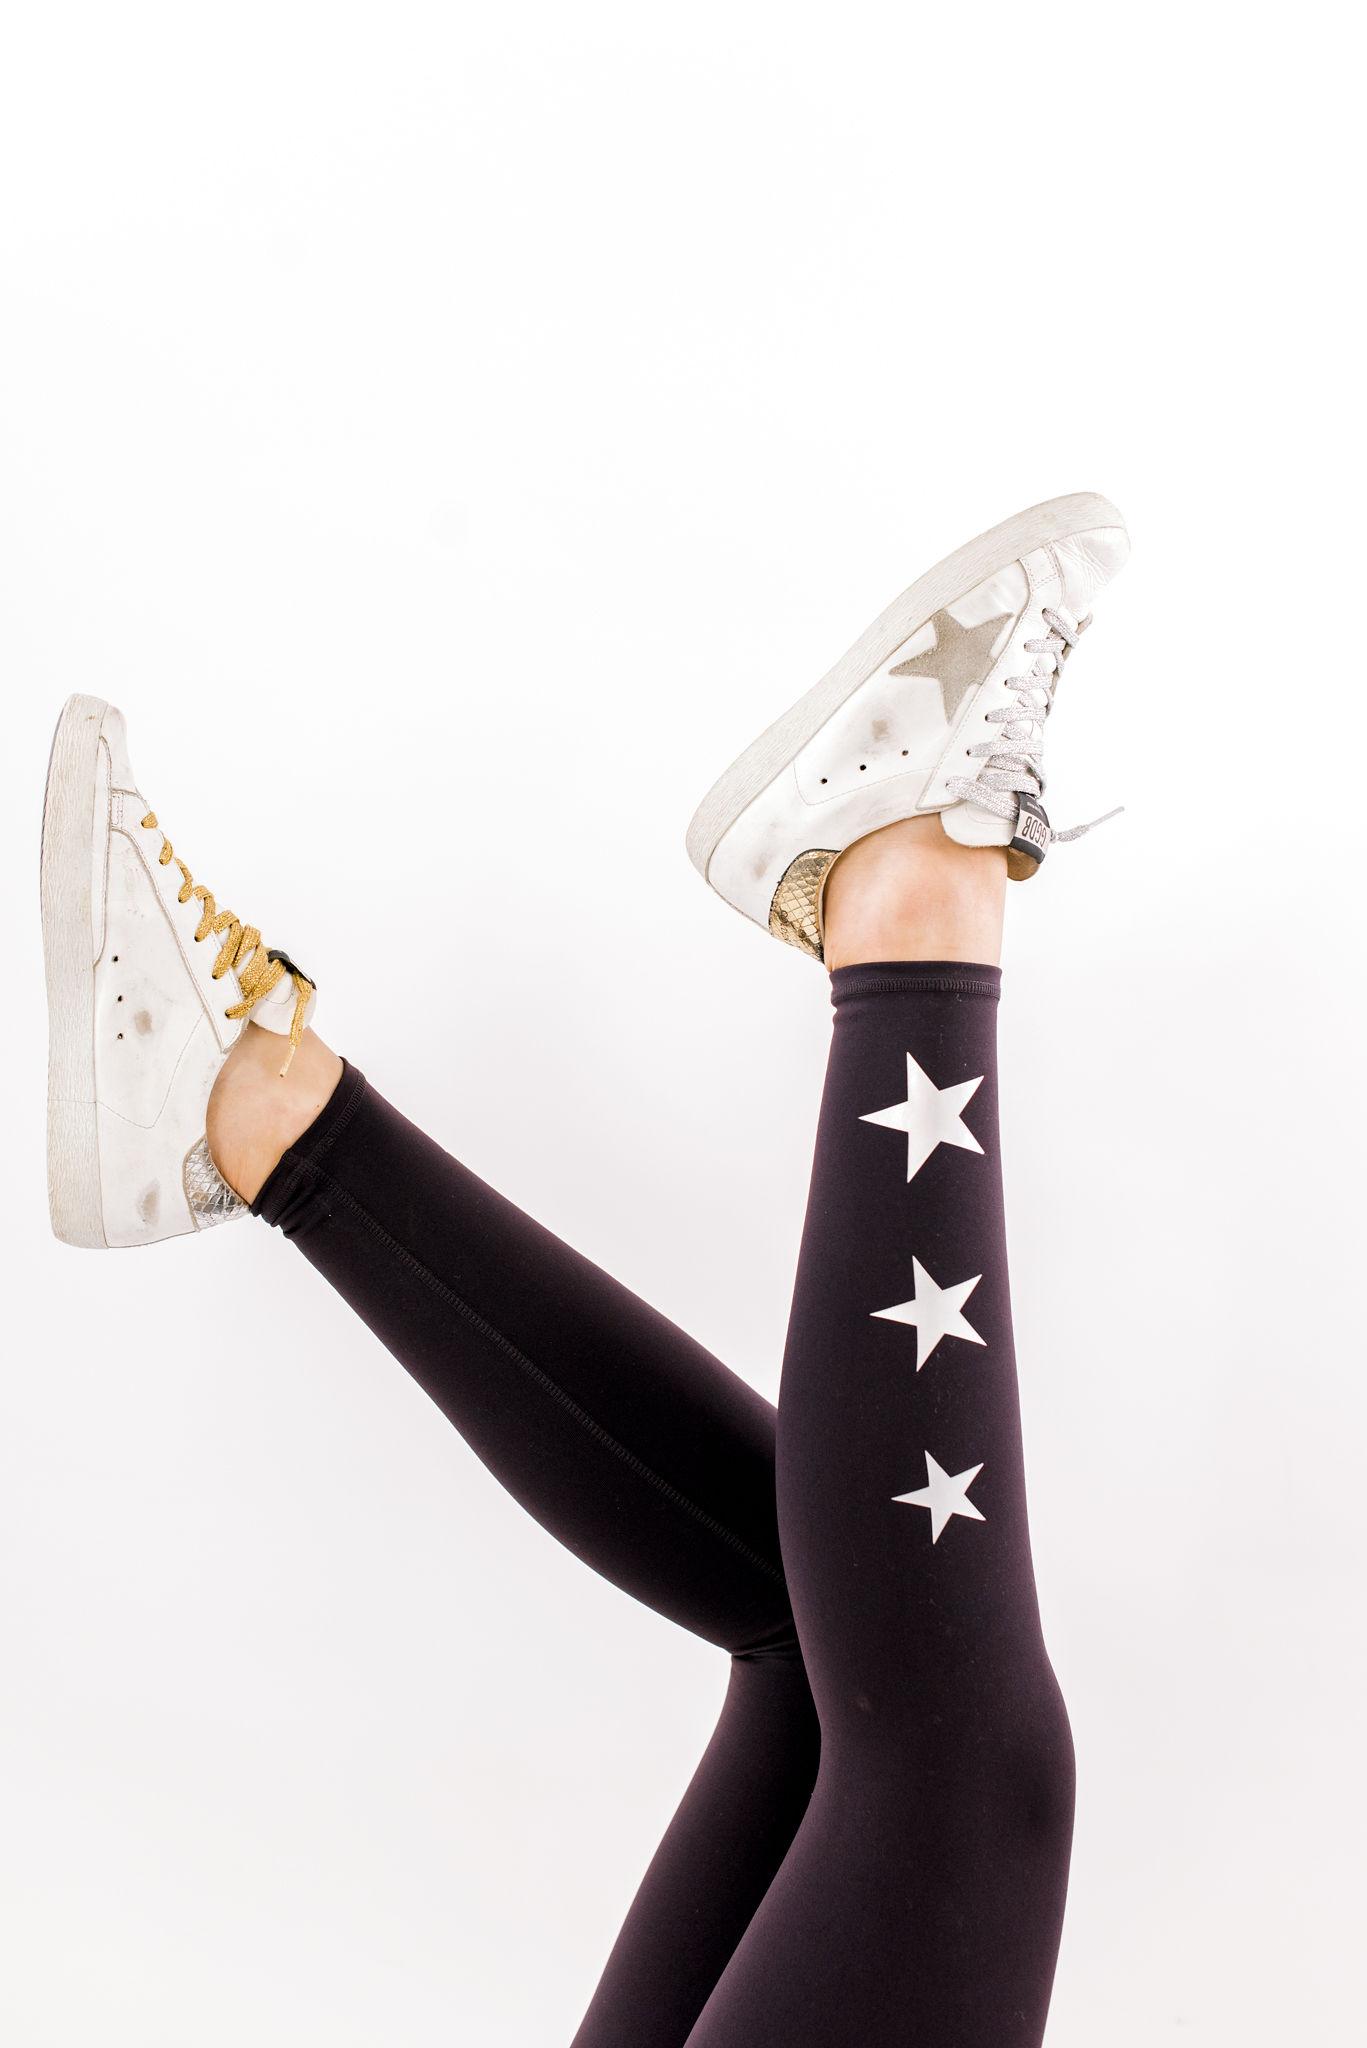 star print leggings, trendy leggings, shop style your senses, athleisure, activewear for women, affordable activewear